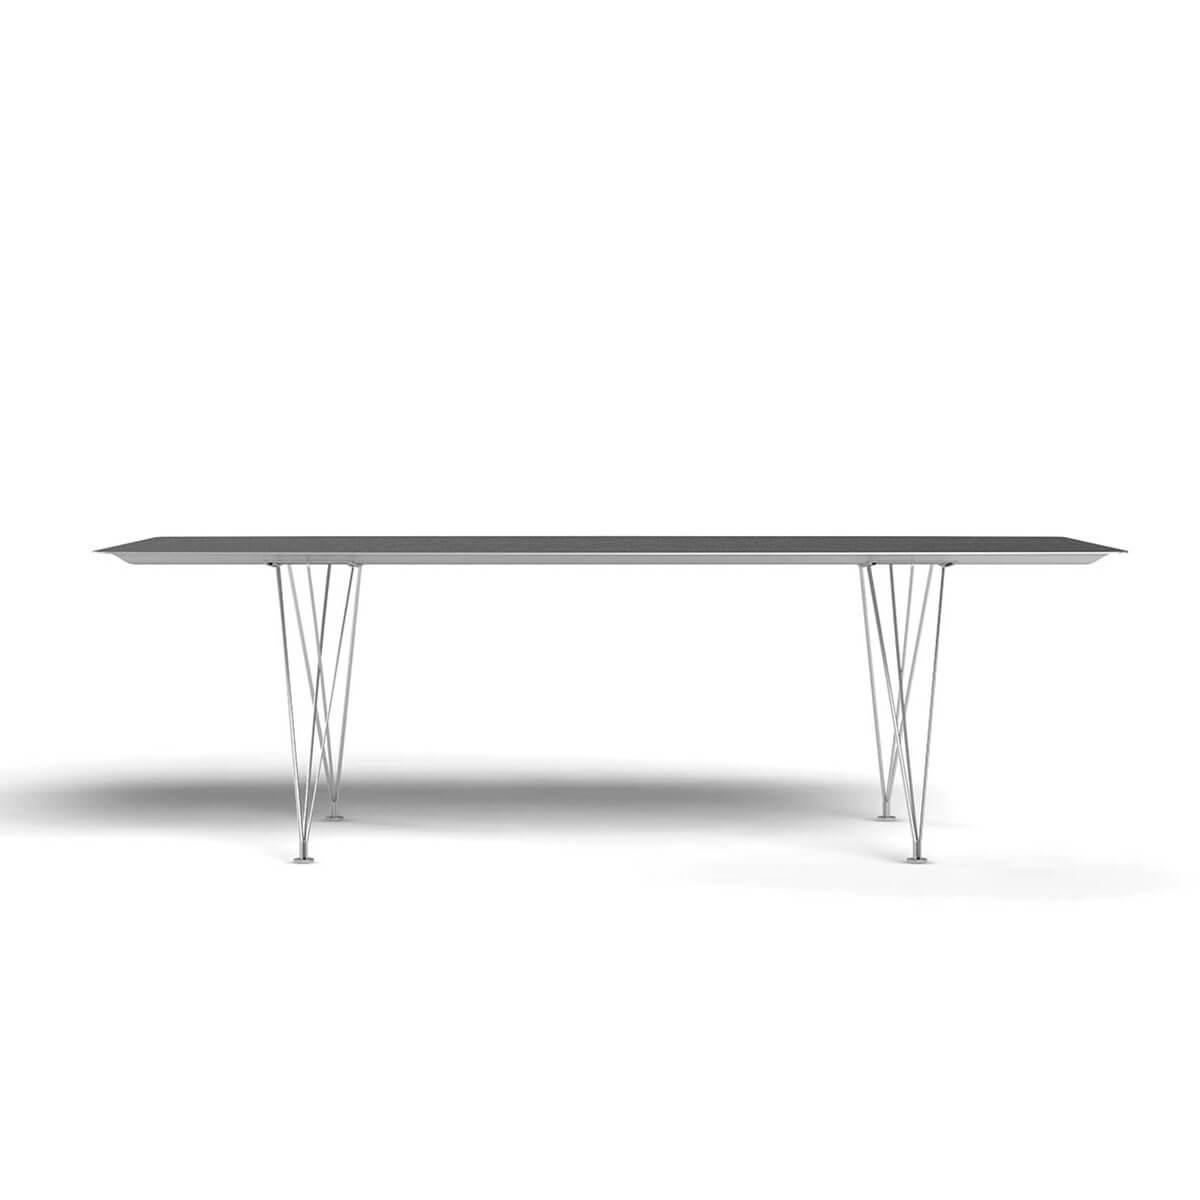 b.d barcelona design  Table B - Steel 办公桌